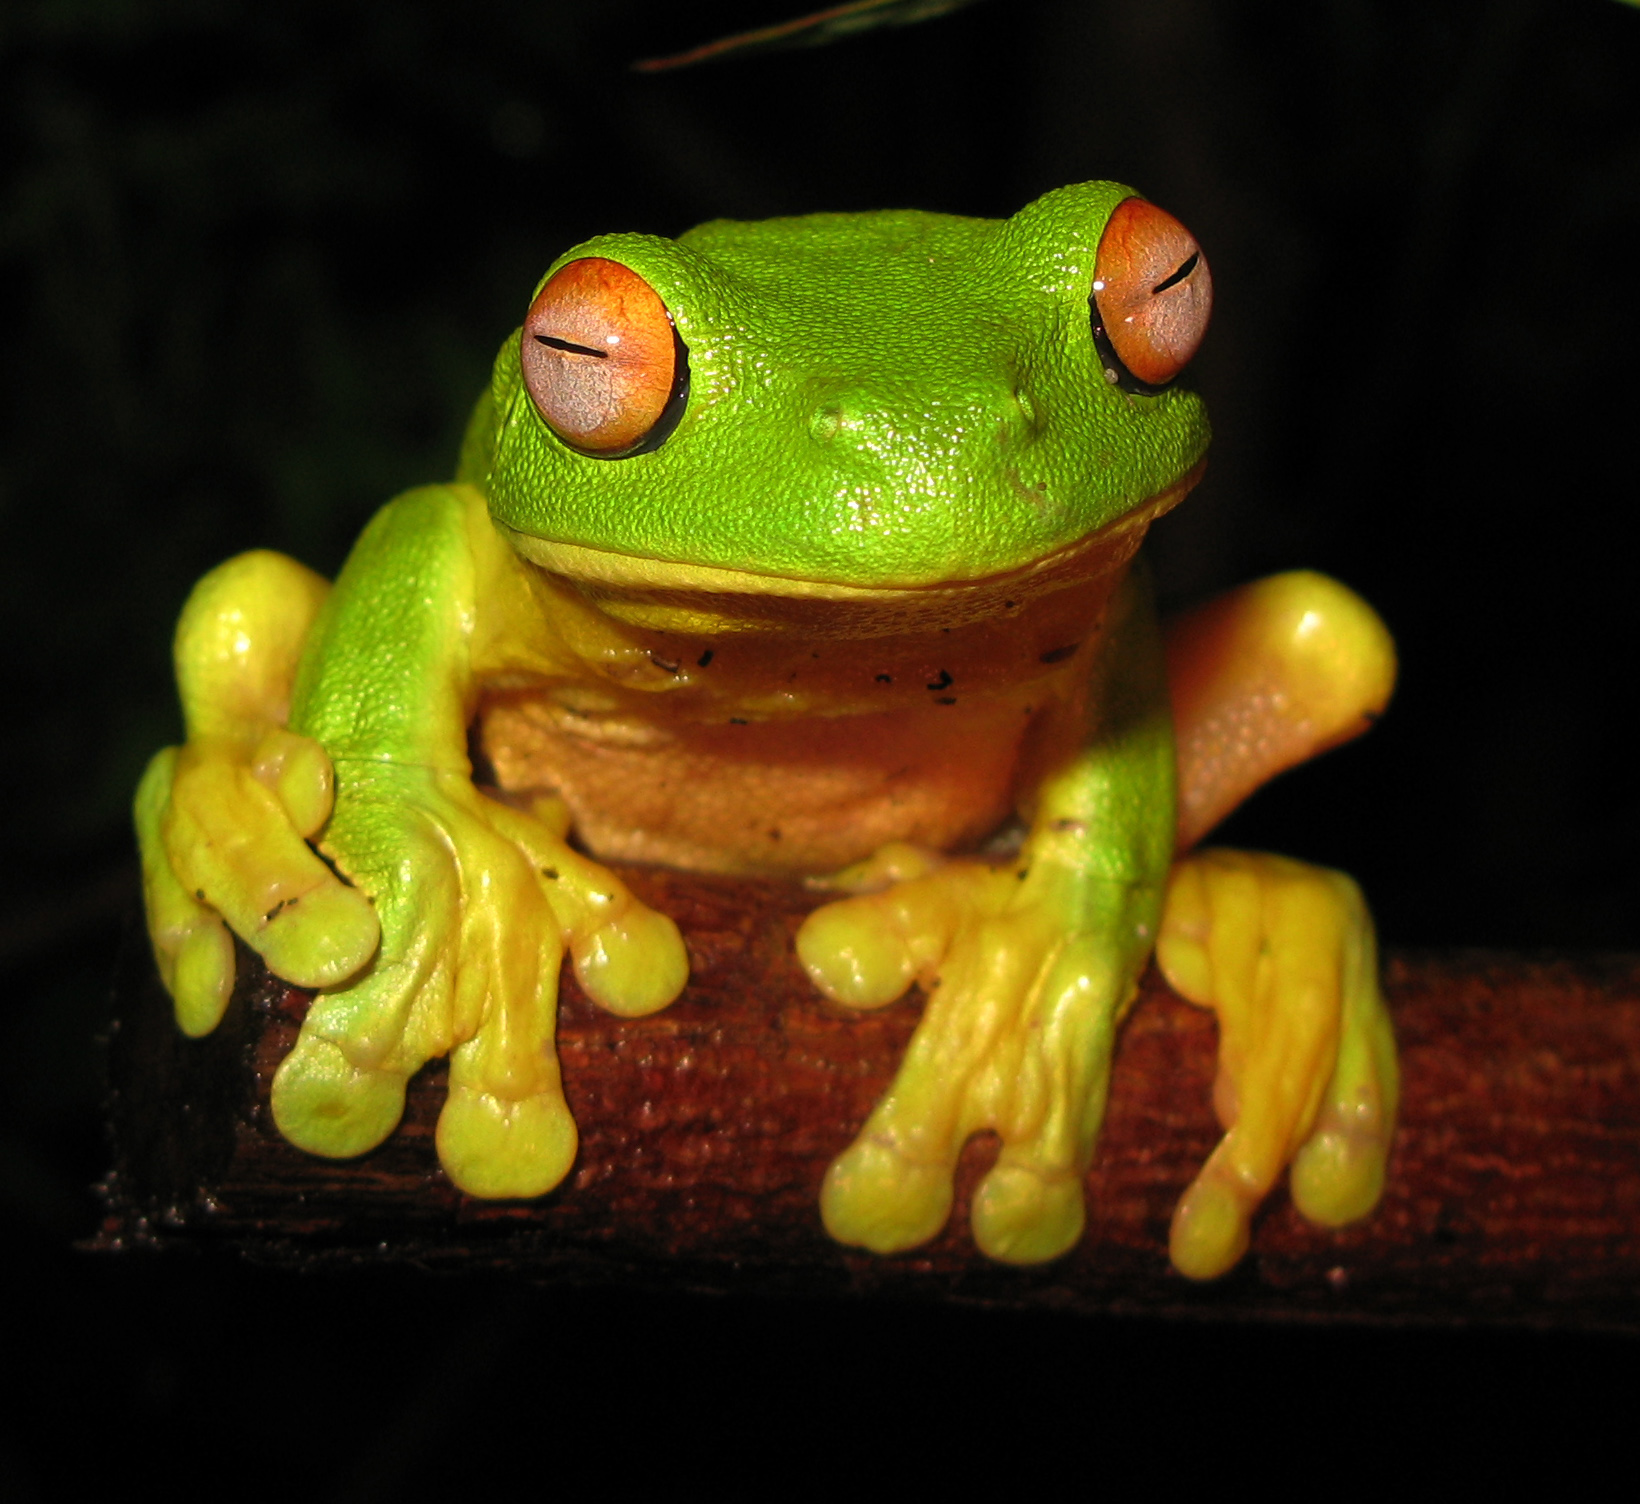 Red Eyed Tree Frog clipart australian On  Pinterest images best